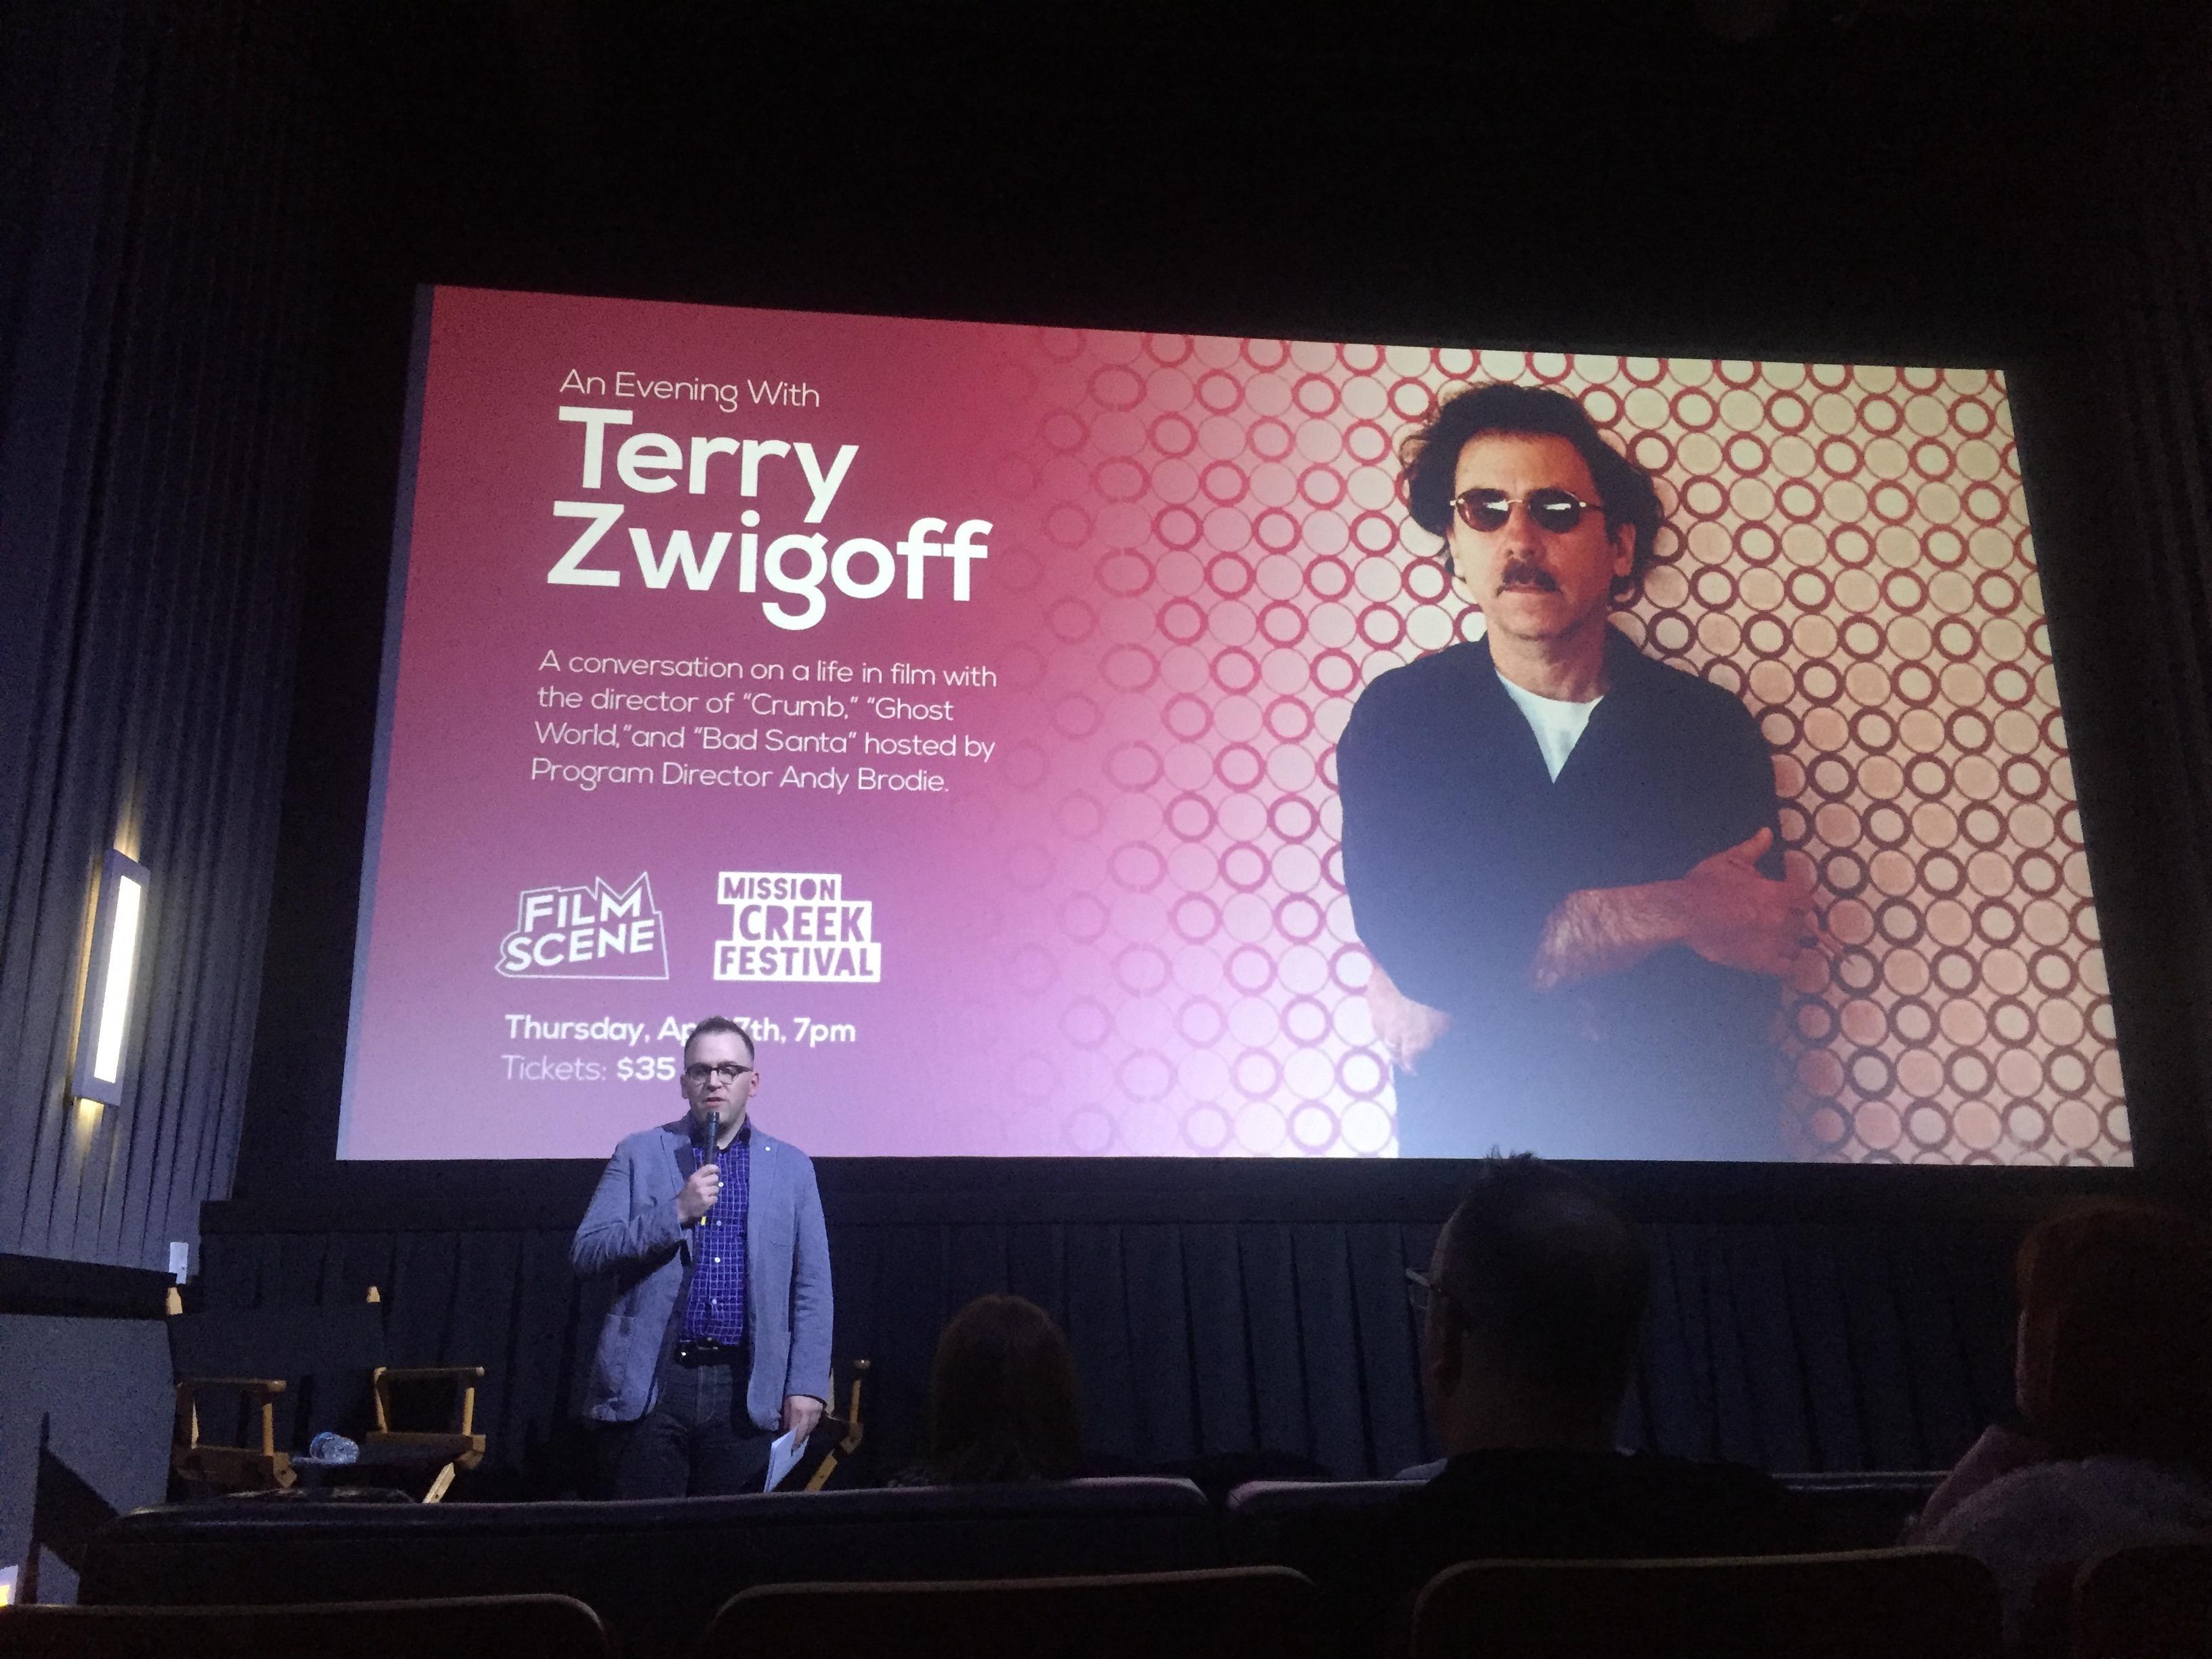 terry zwigoff new movie